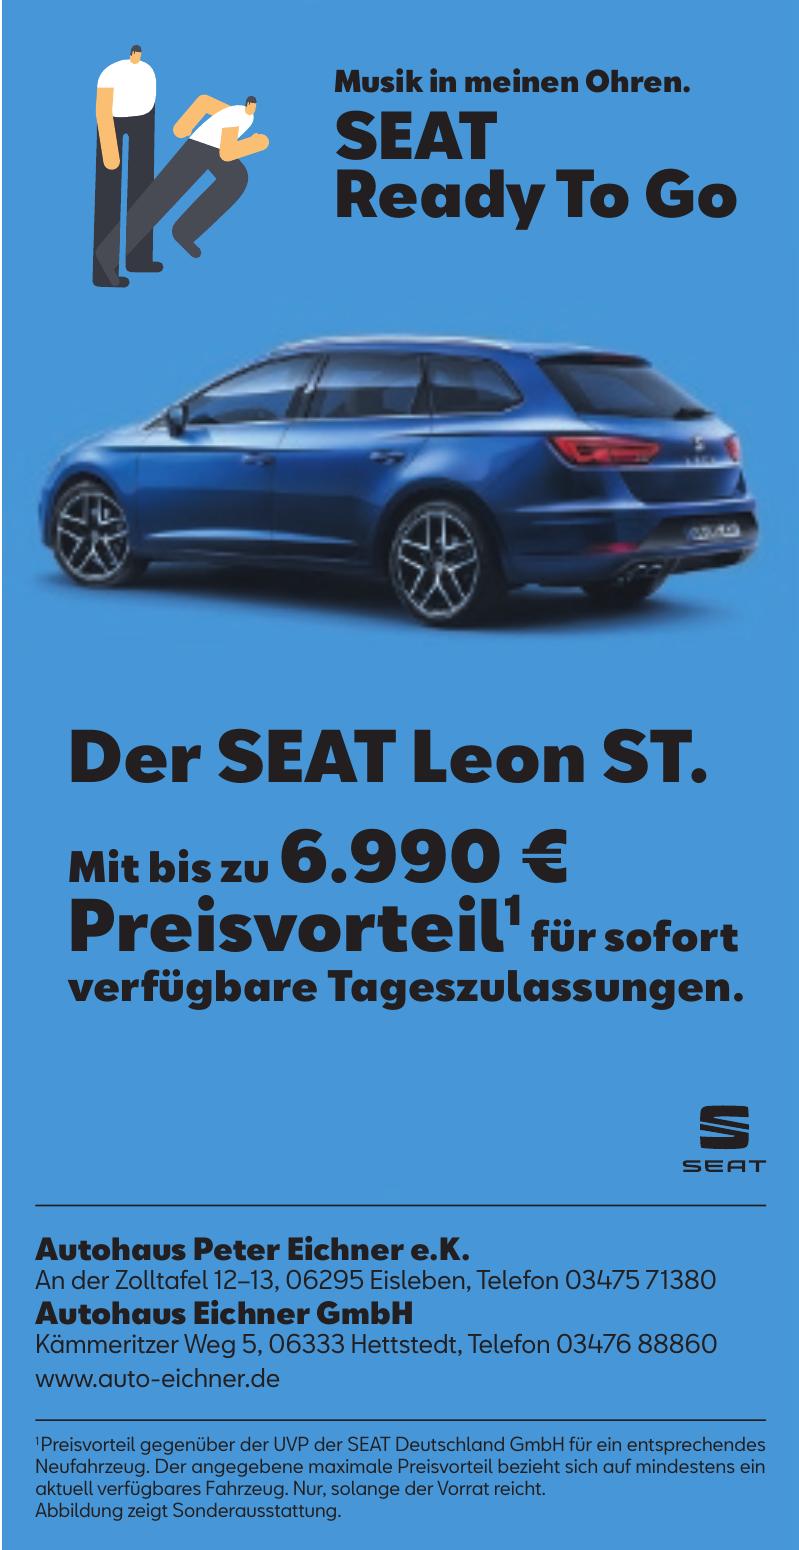 Autohaus Peter Eichner e.K.